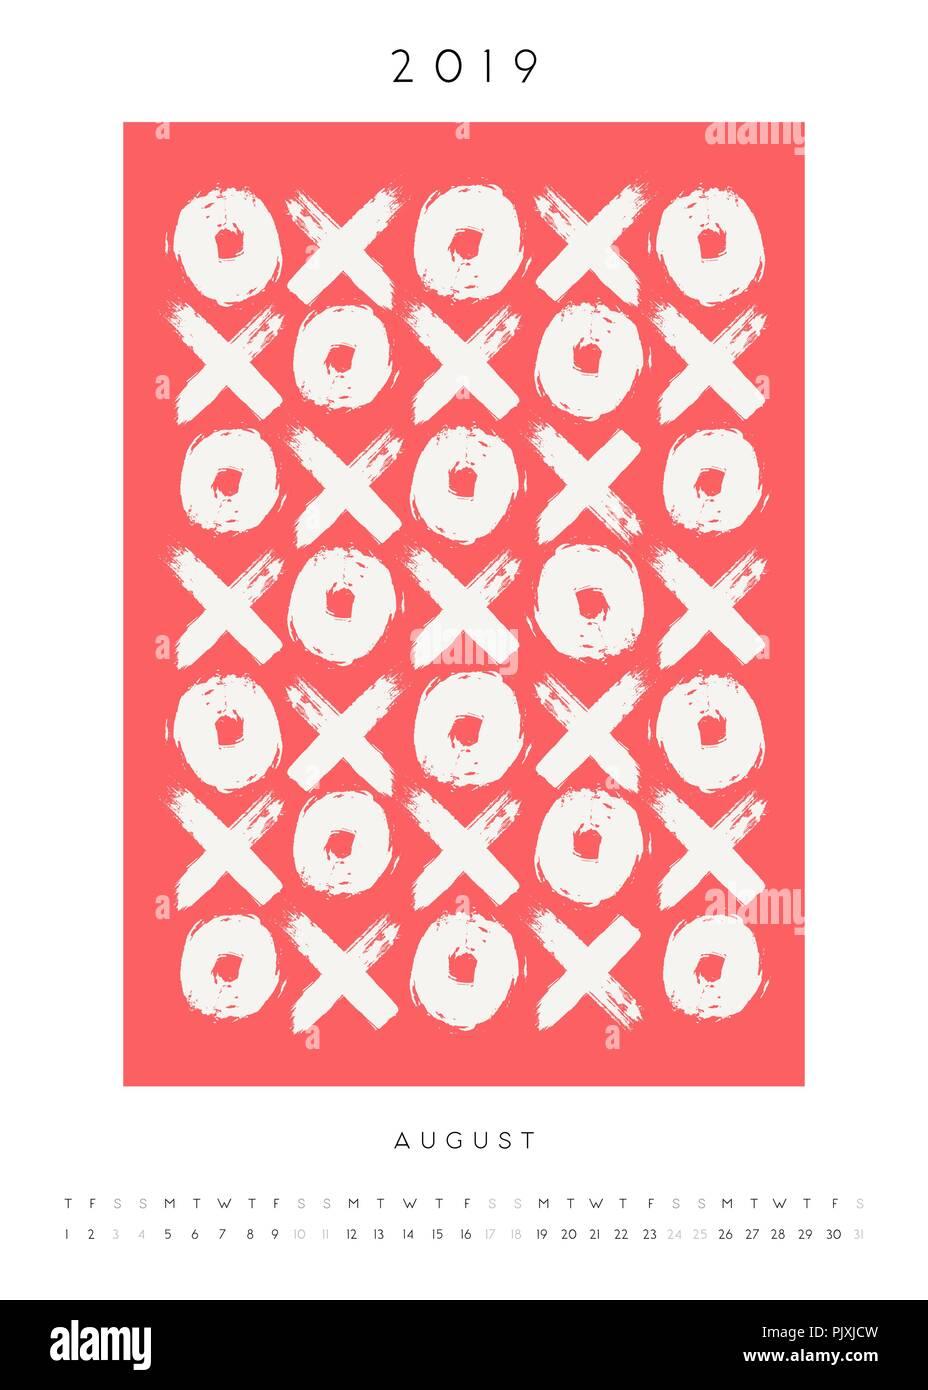 Printable A4 Size August 2019 Calendar Template Hand Drawn Symbols